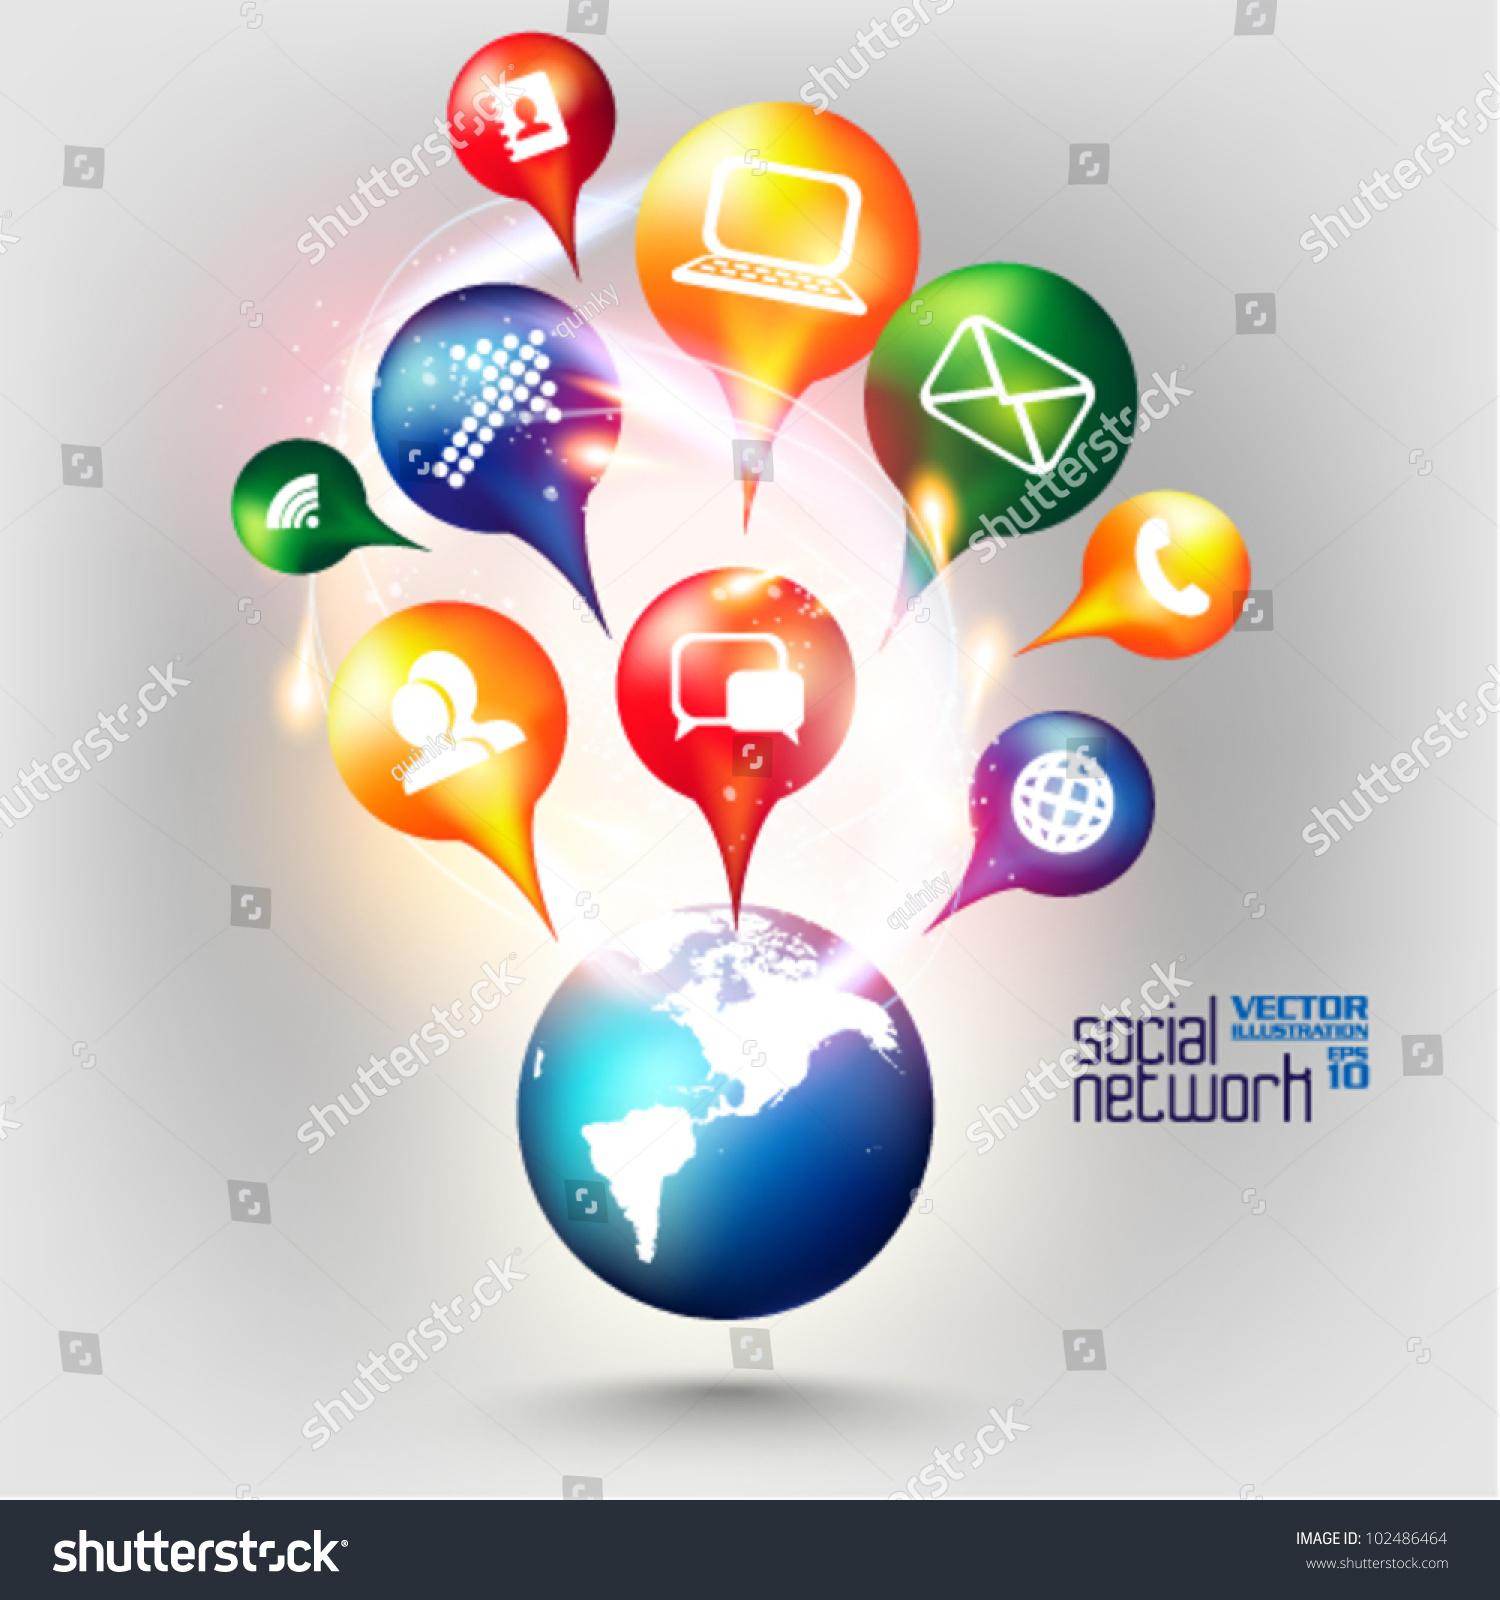 Modern Conceptual Digital Application Social Network